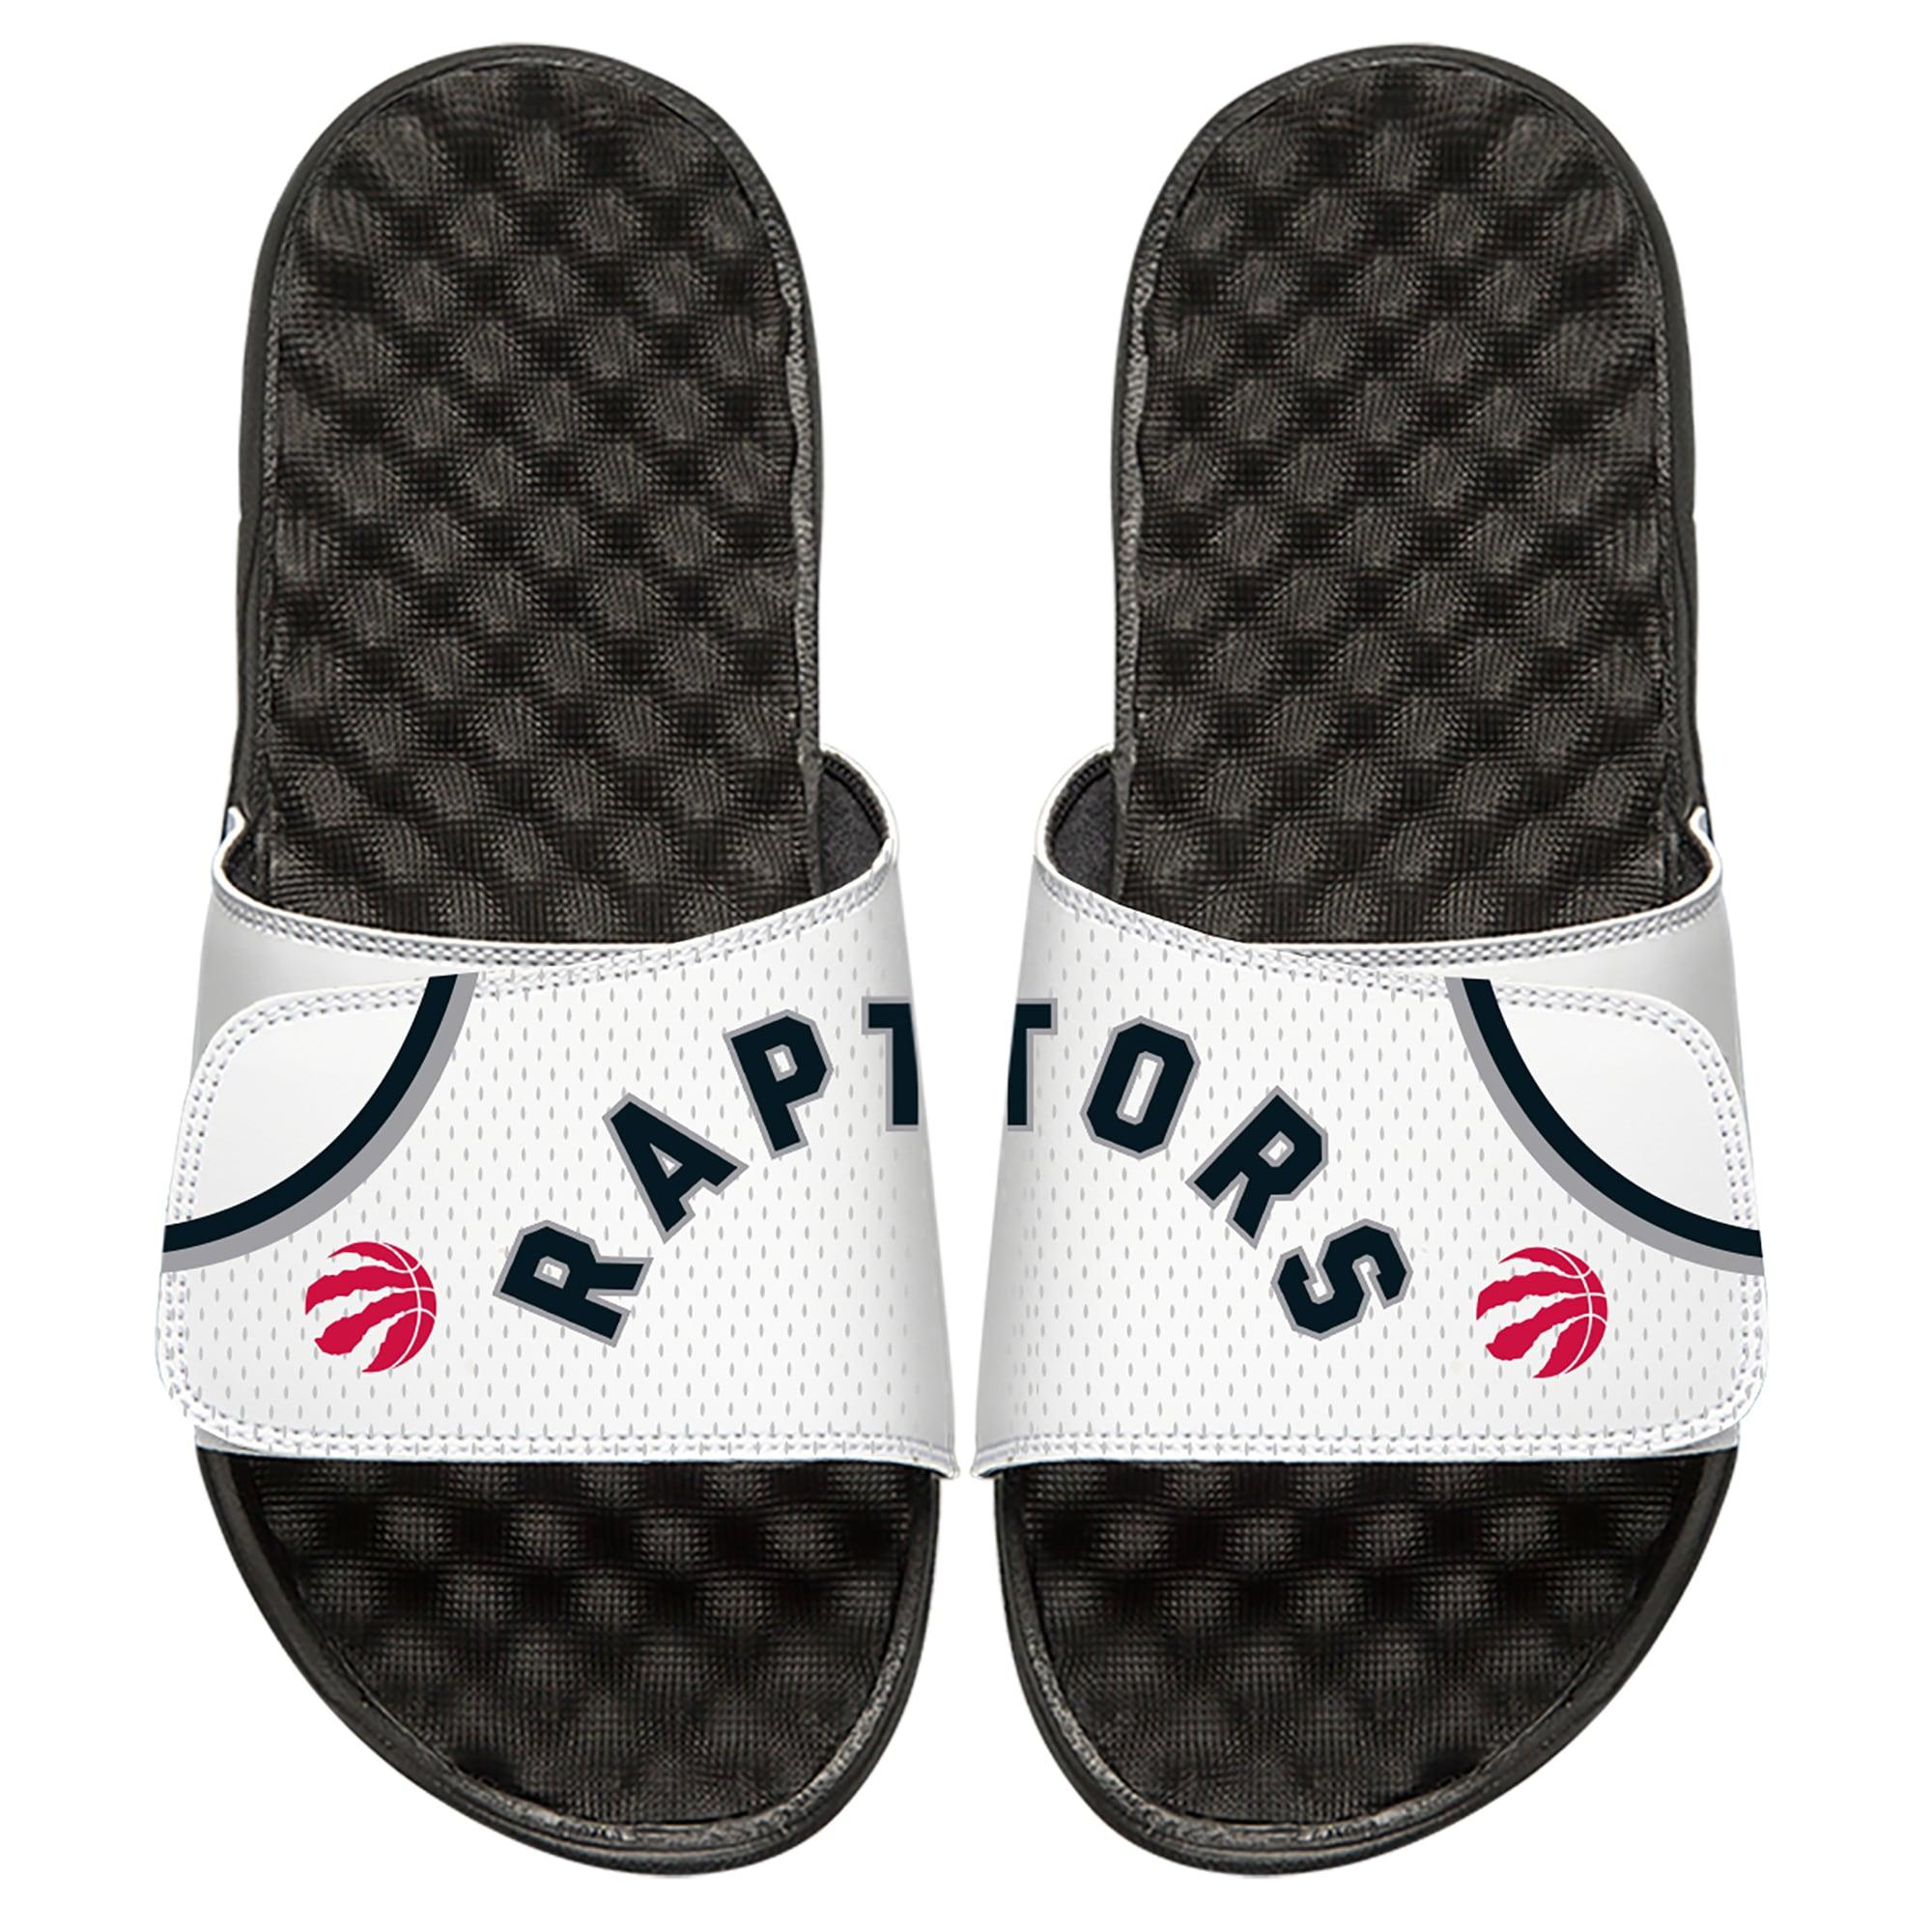 Toronto Raptors ISlide Home Jersey Split Slide Sandals - White